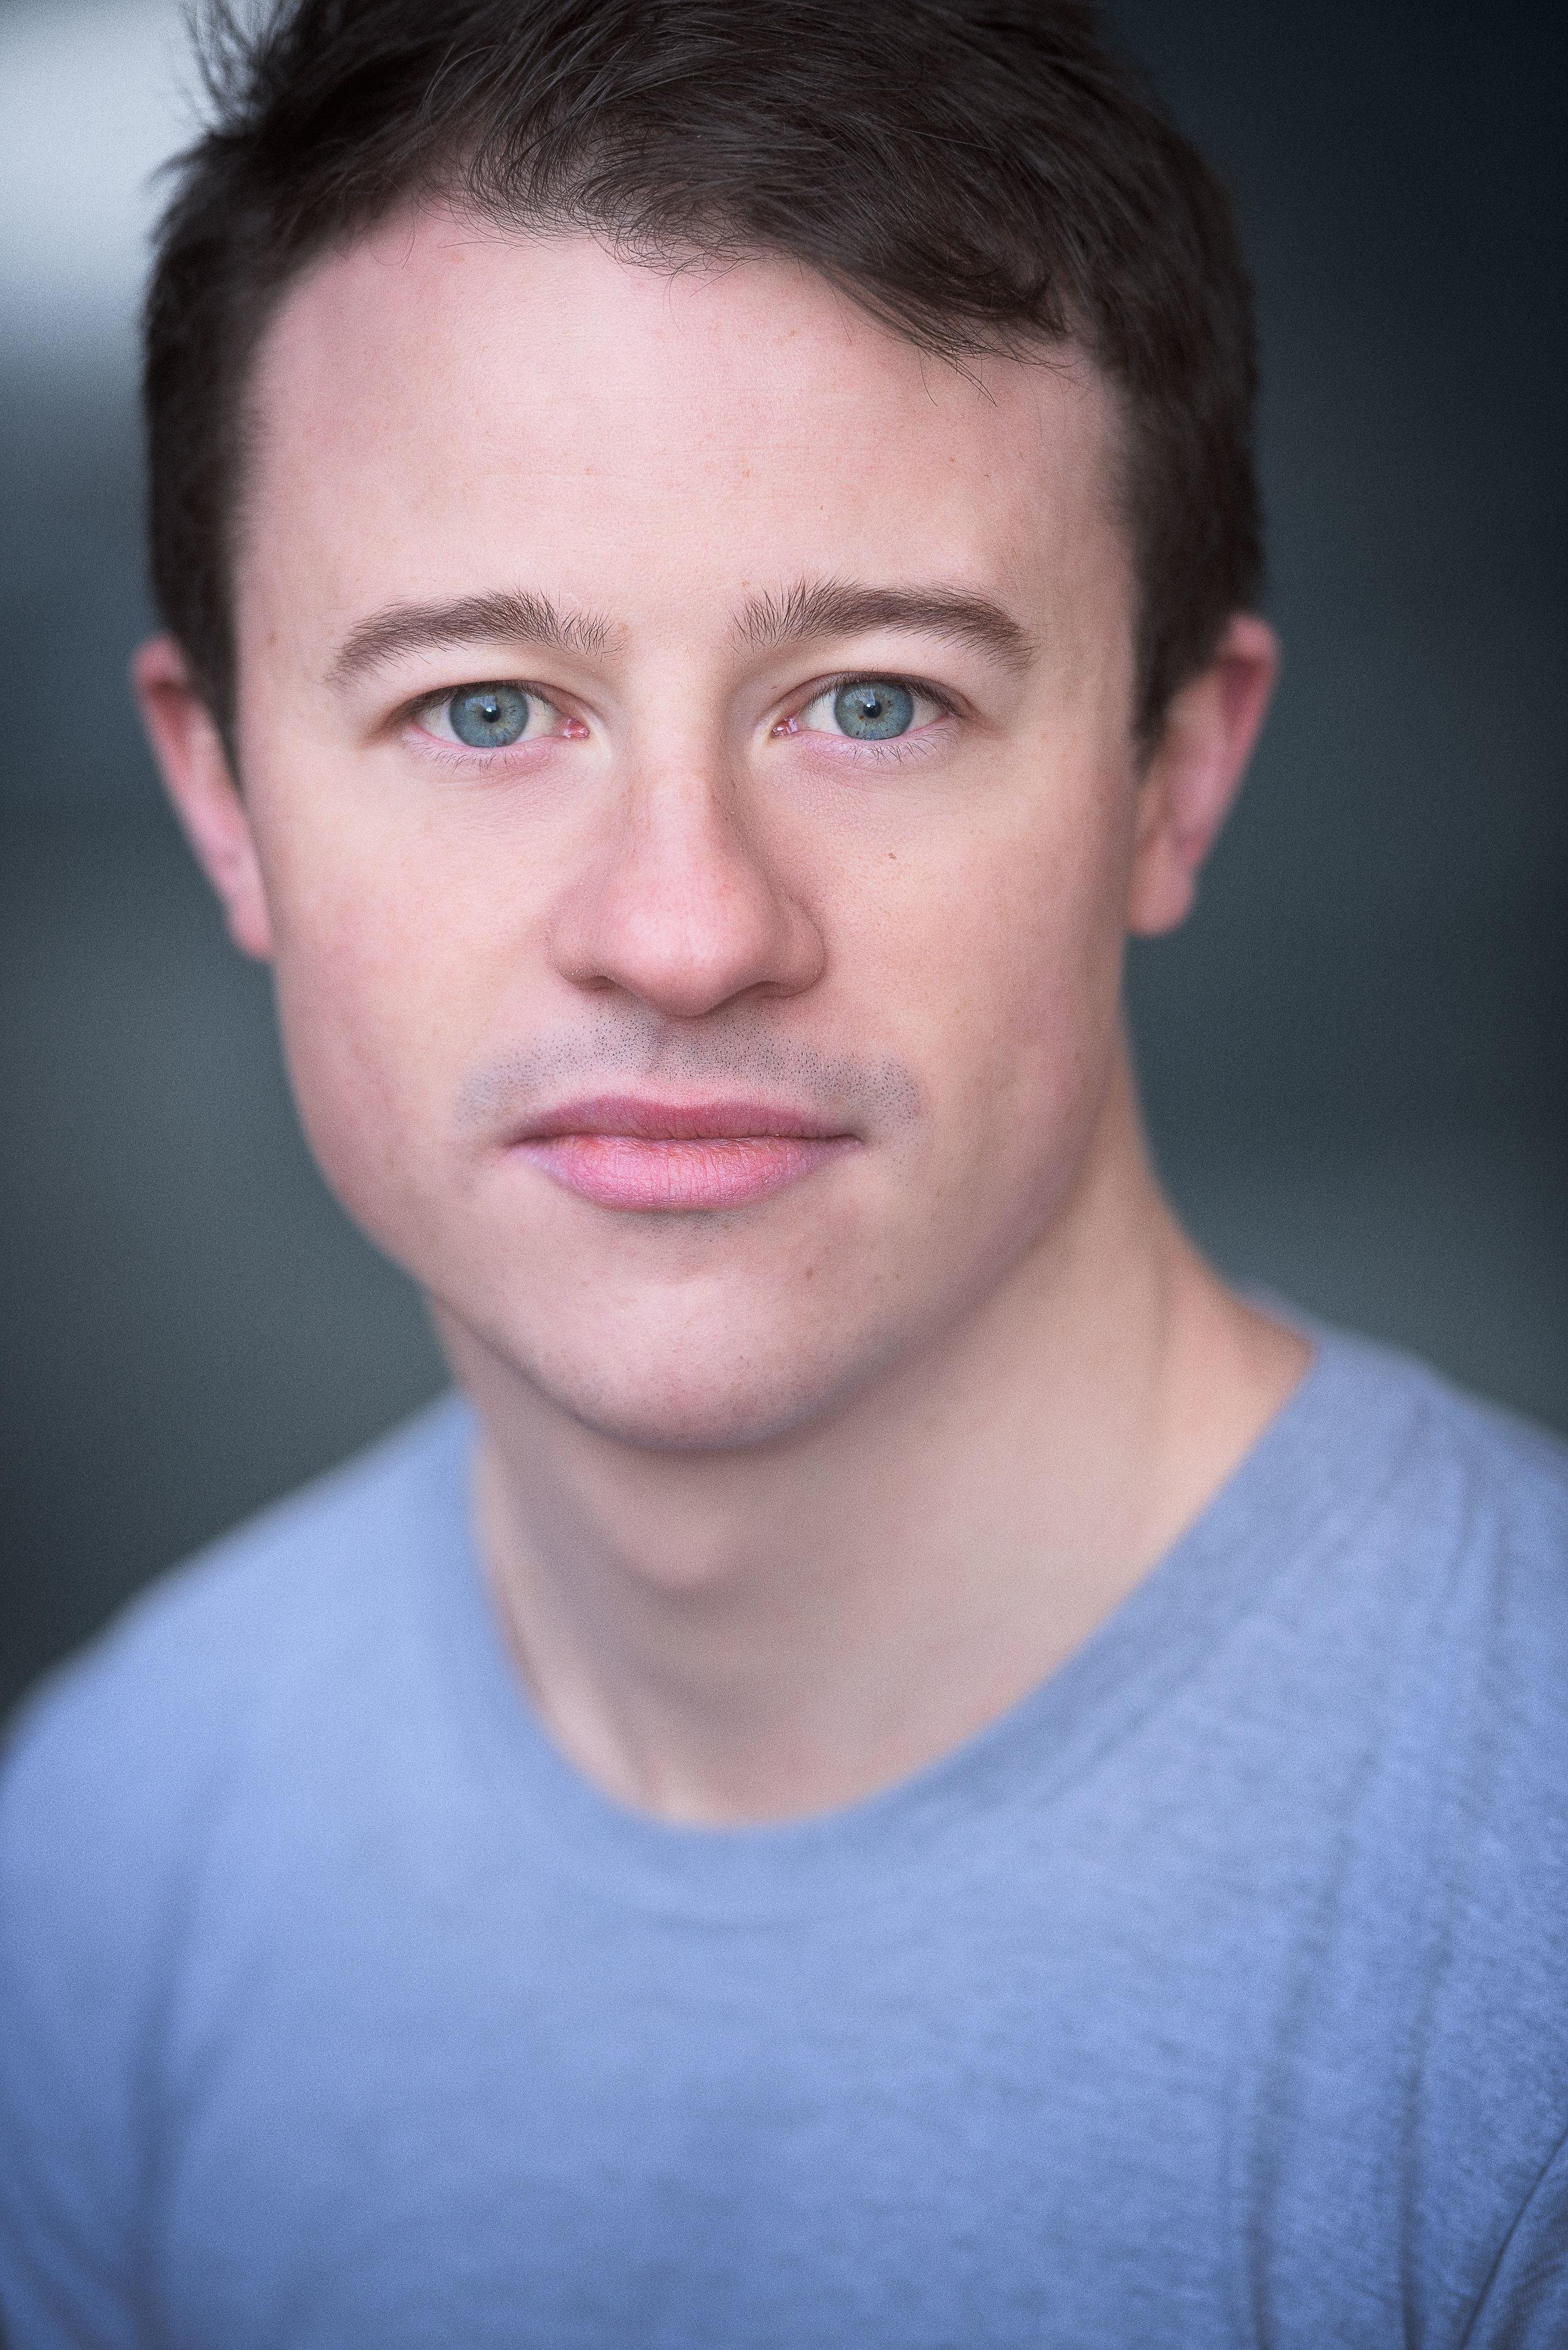 Sean-Burke-001.jpg